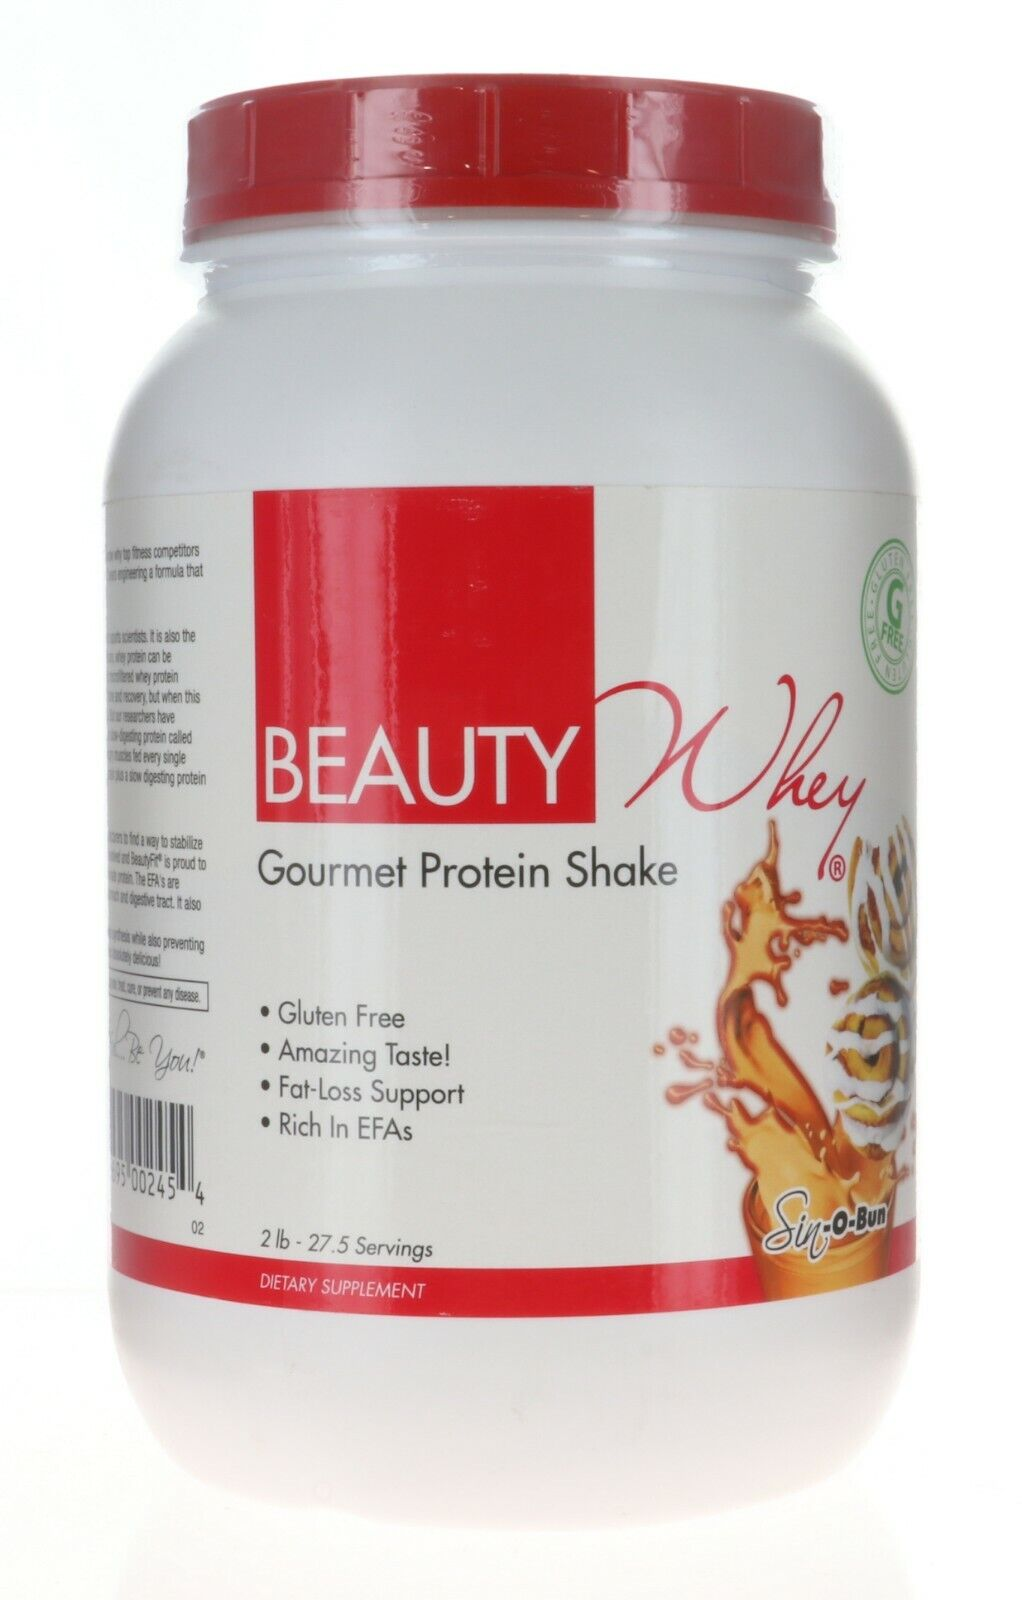 BeautyFit Beauty Whey, Gourmet Protein Powder For Women, SIN